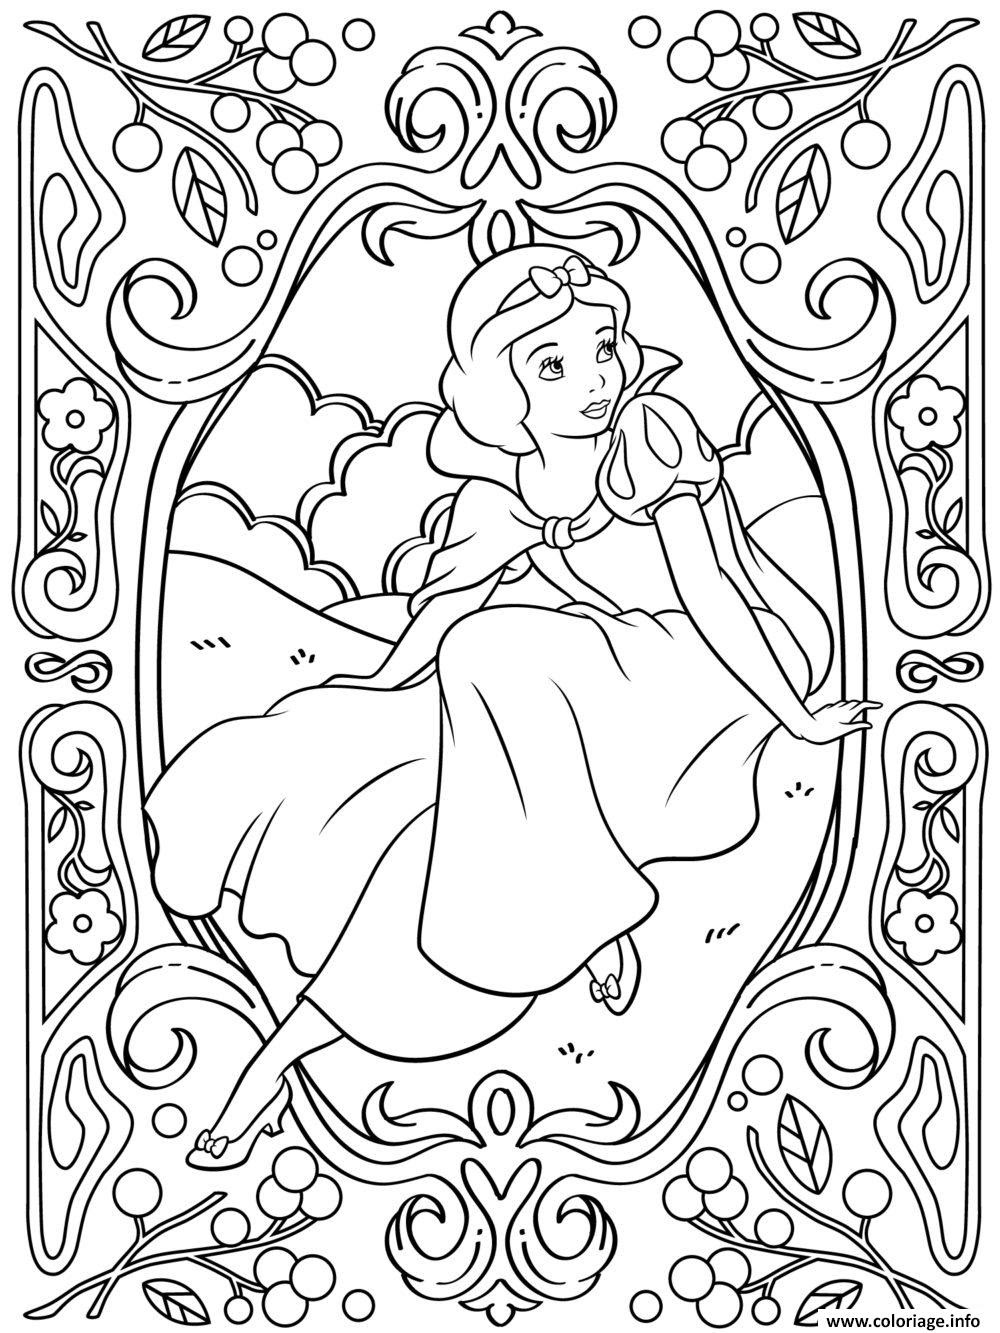 Coloriage Mandala Disney Princesse Blanche Neige Dessin  Imprimer